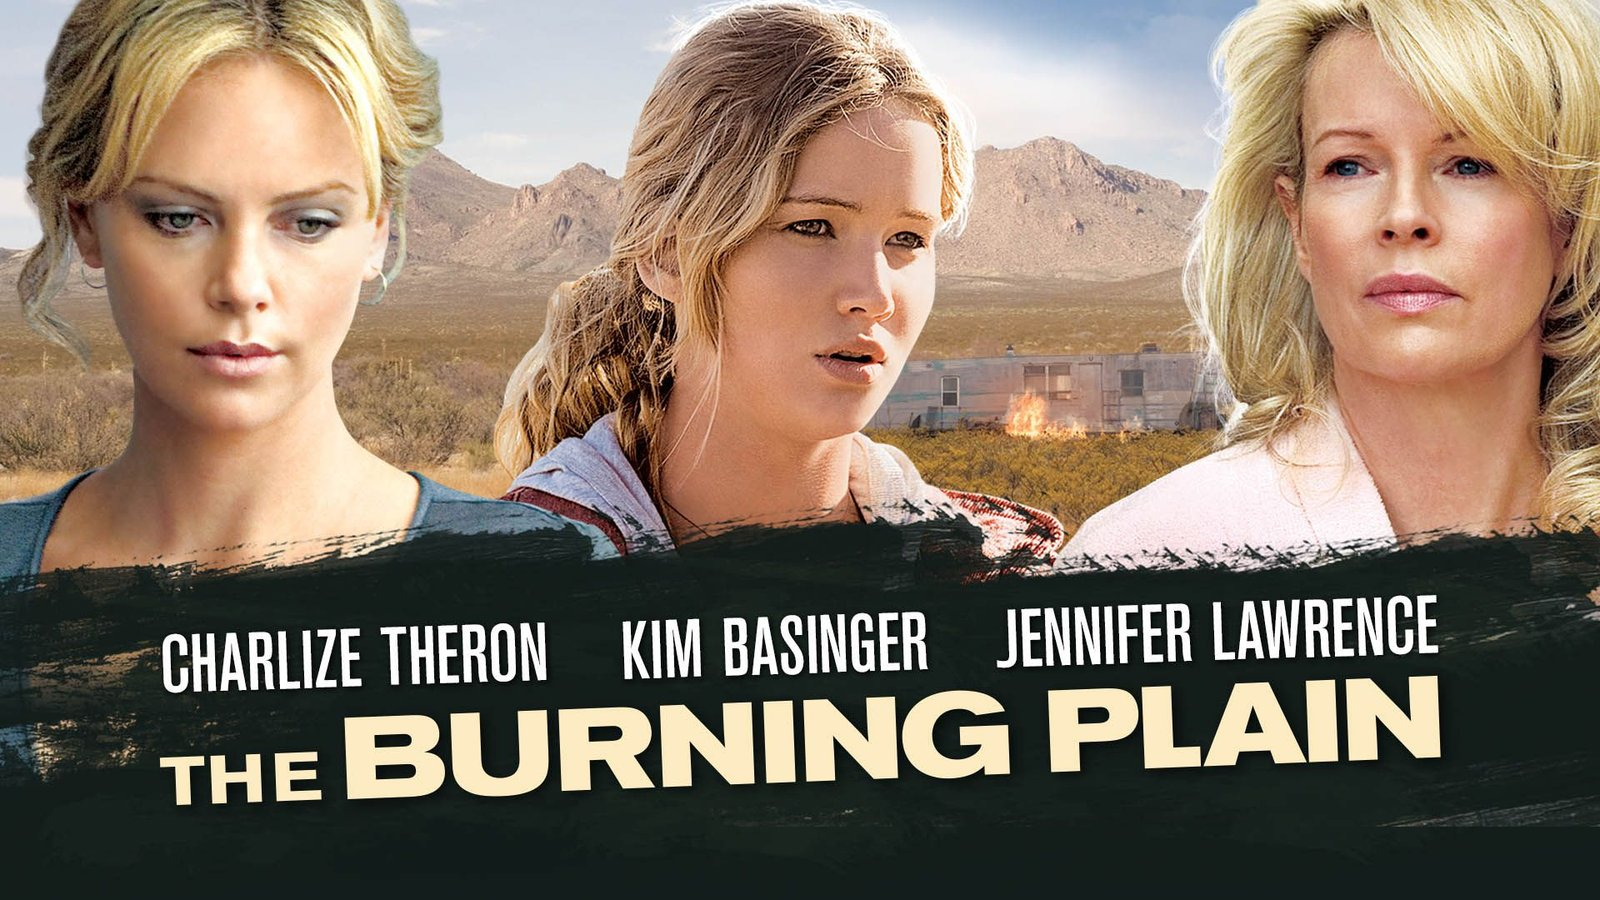 The Burning Plain